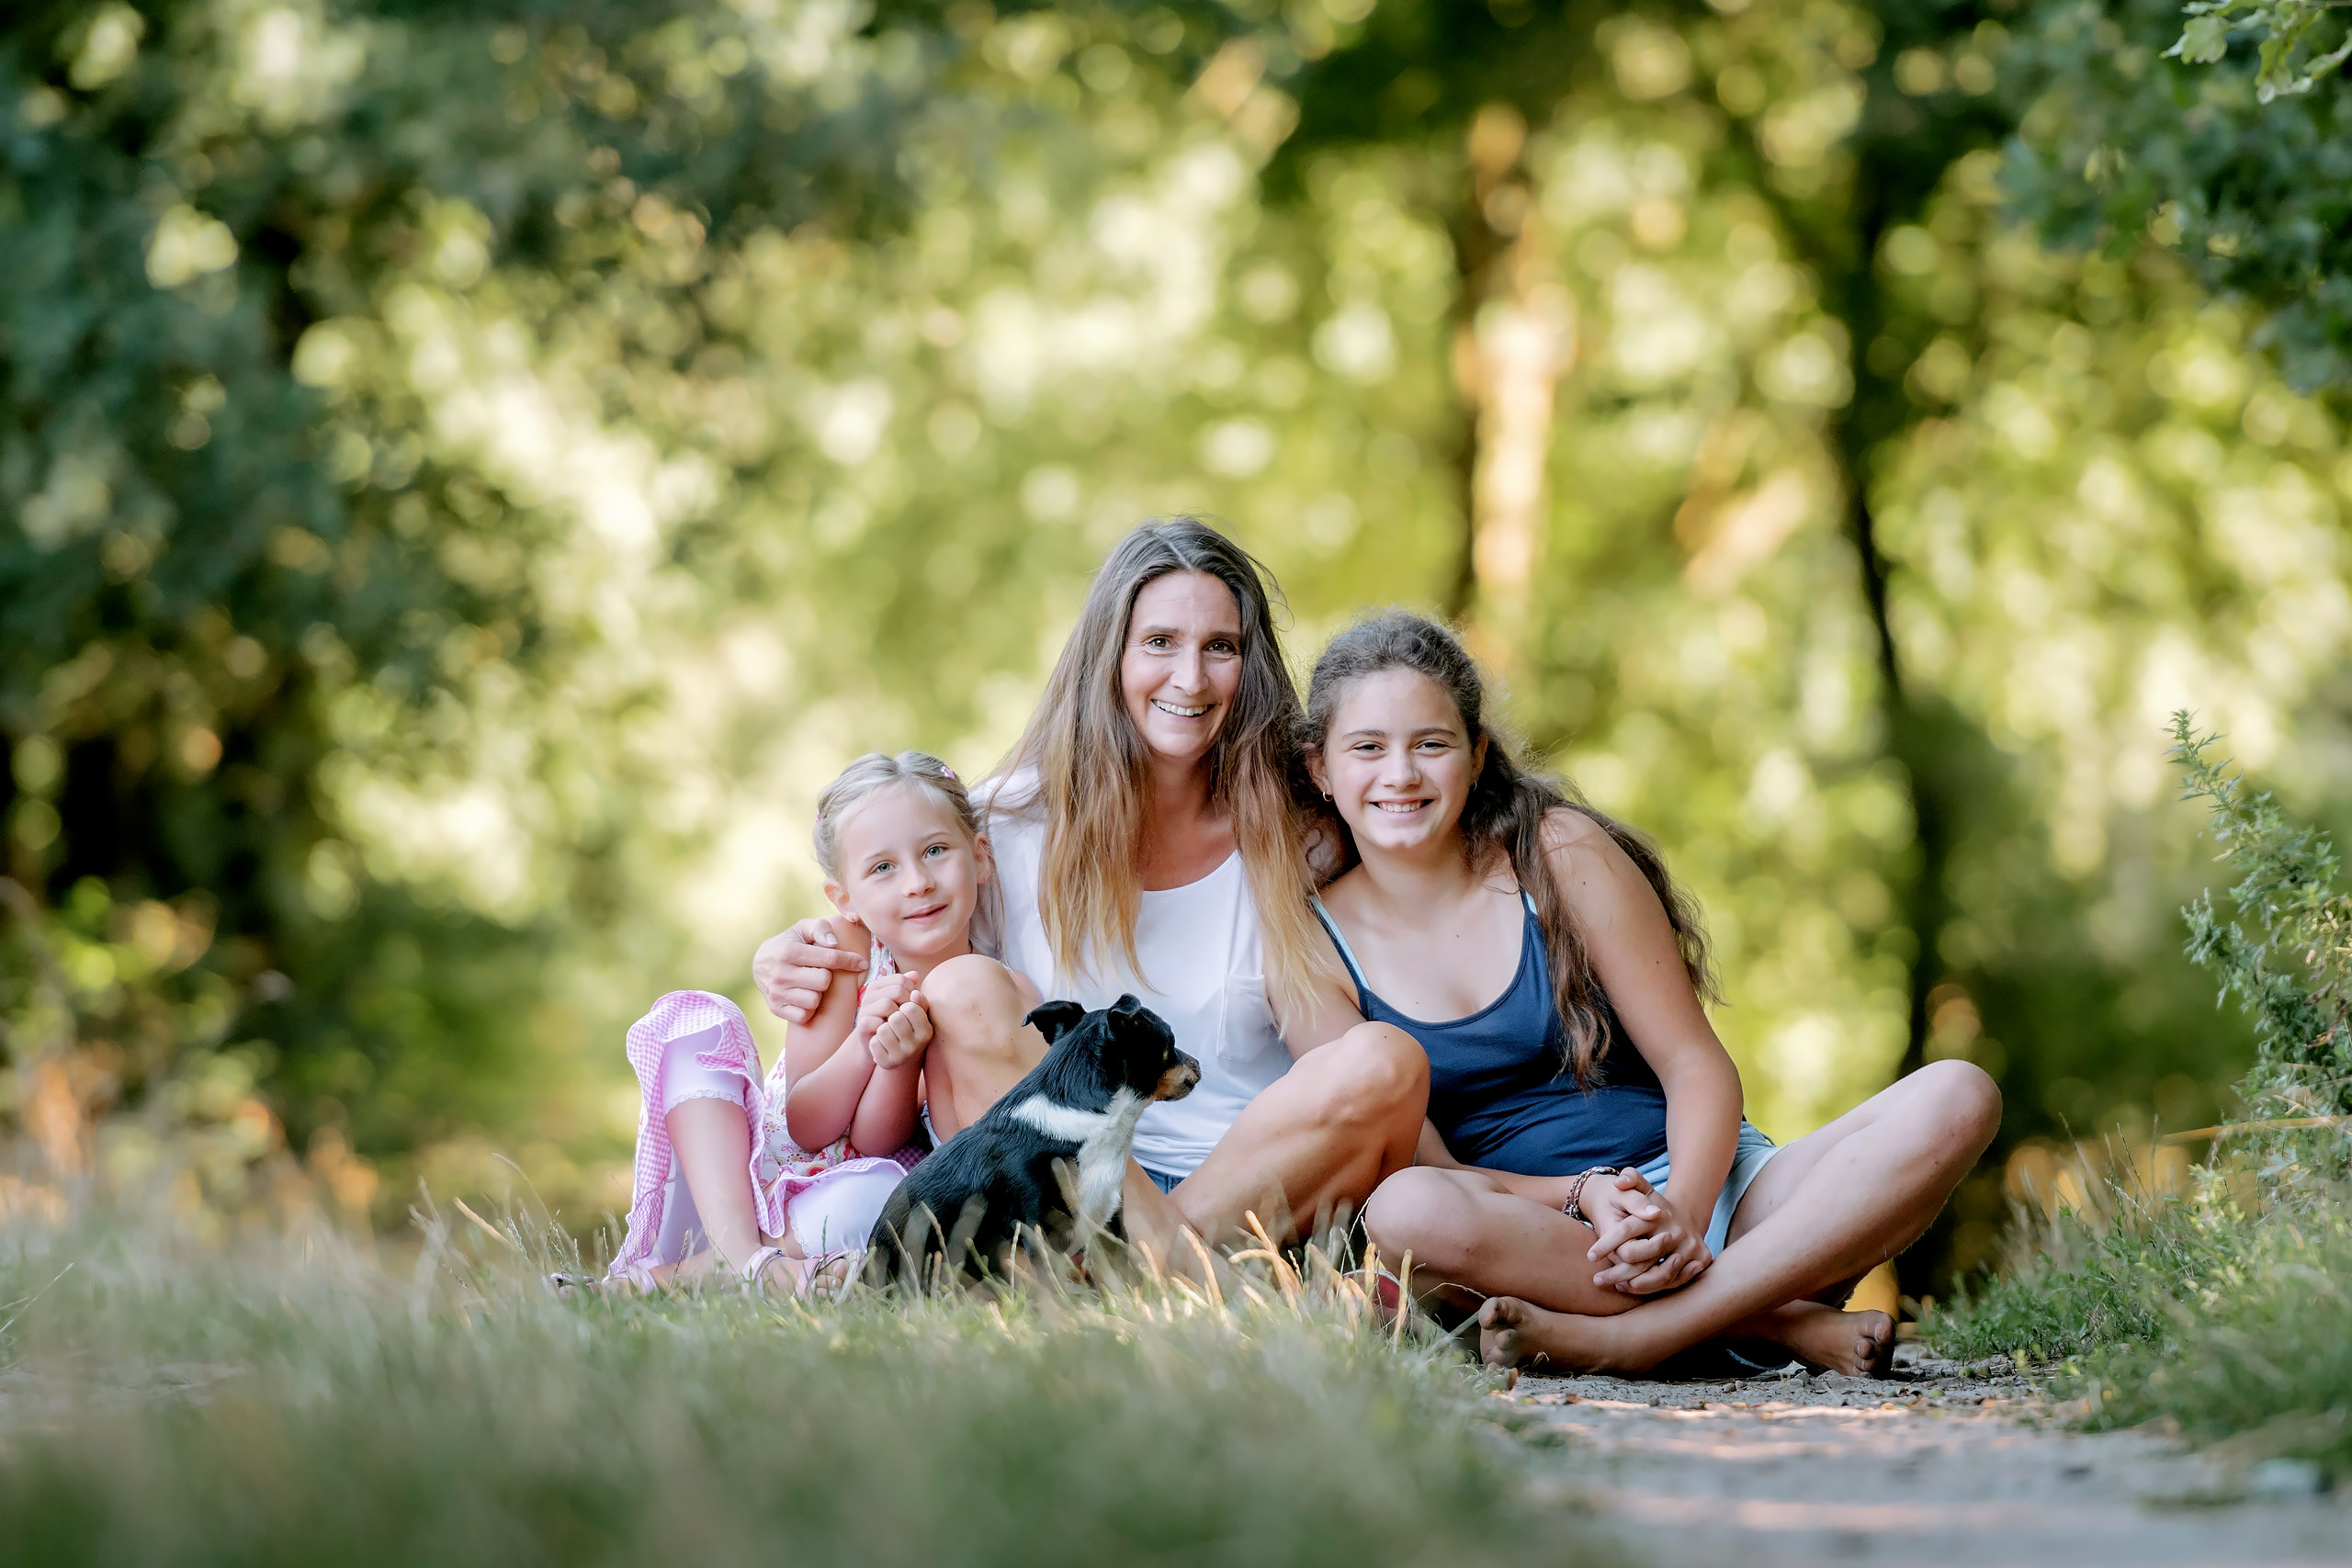 Familienfotografie-Braunschweig-Mutter-Toechter